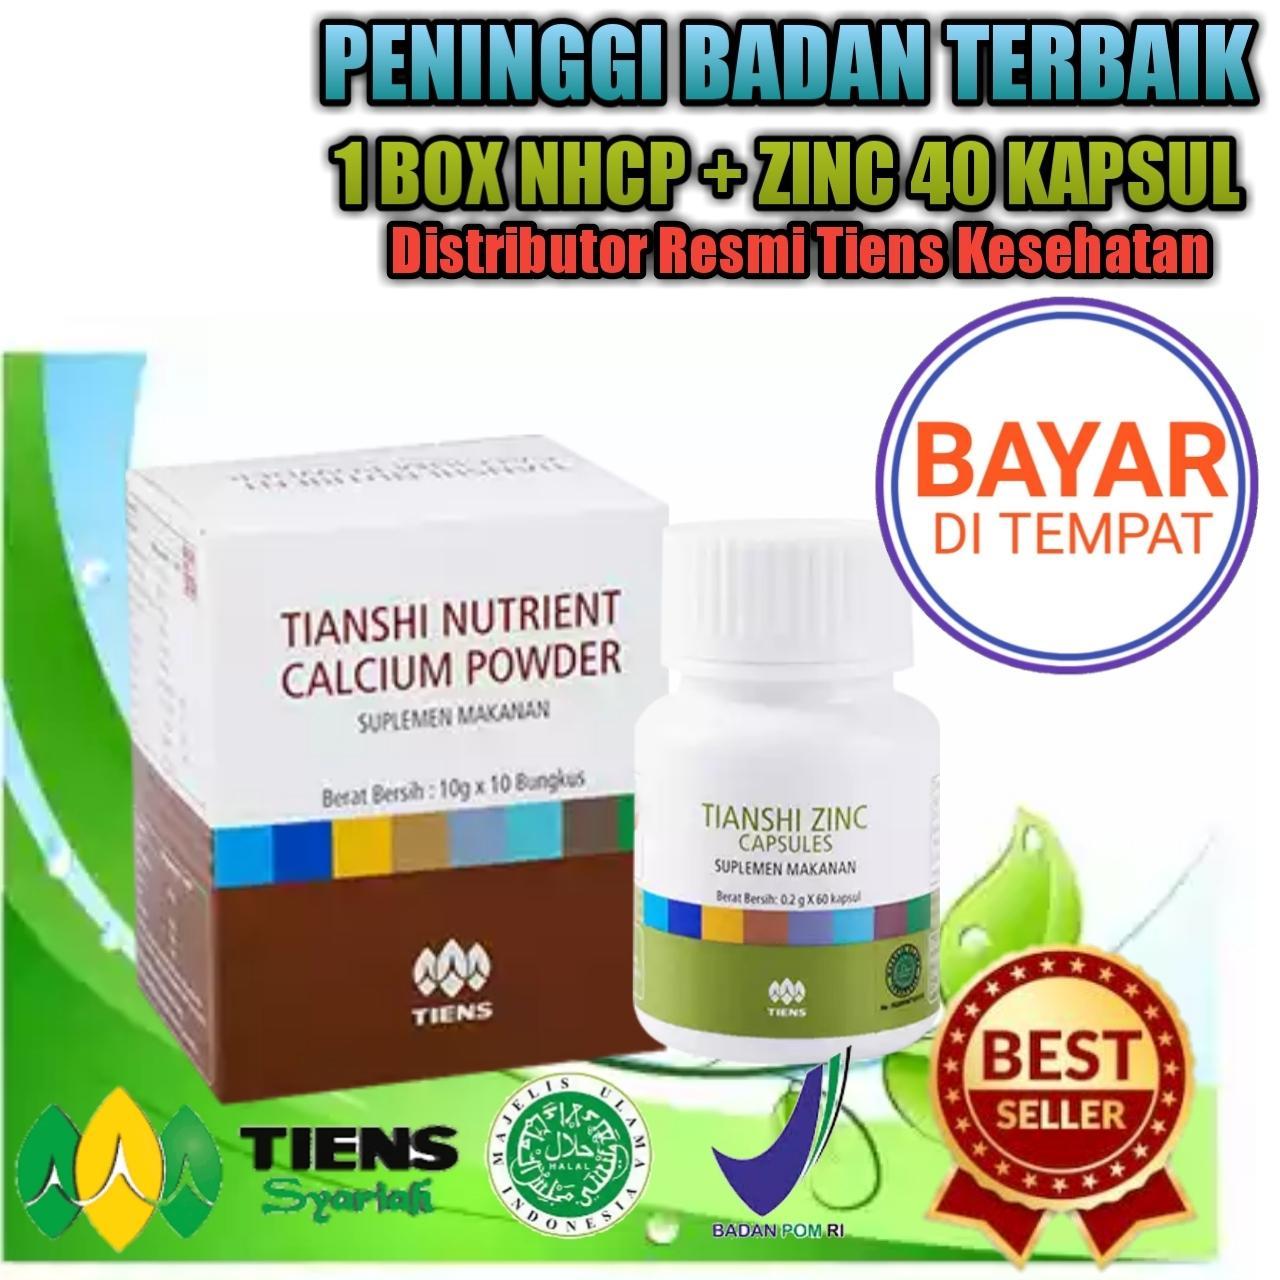 Best Seller Peninggi Badan Nutrient High Calcium Powder dan Zinc Elkishop Tiens. RP 330.174.